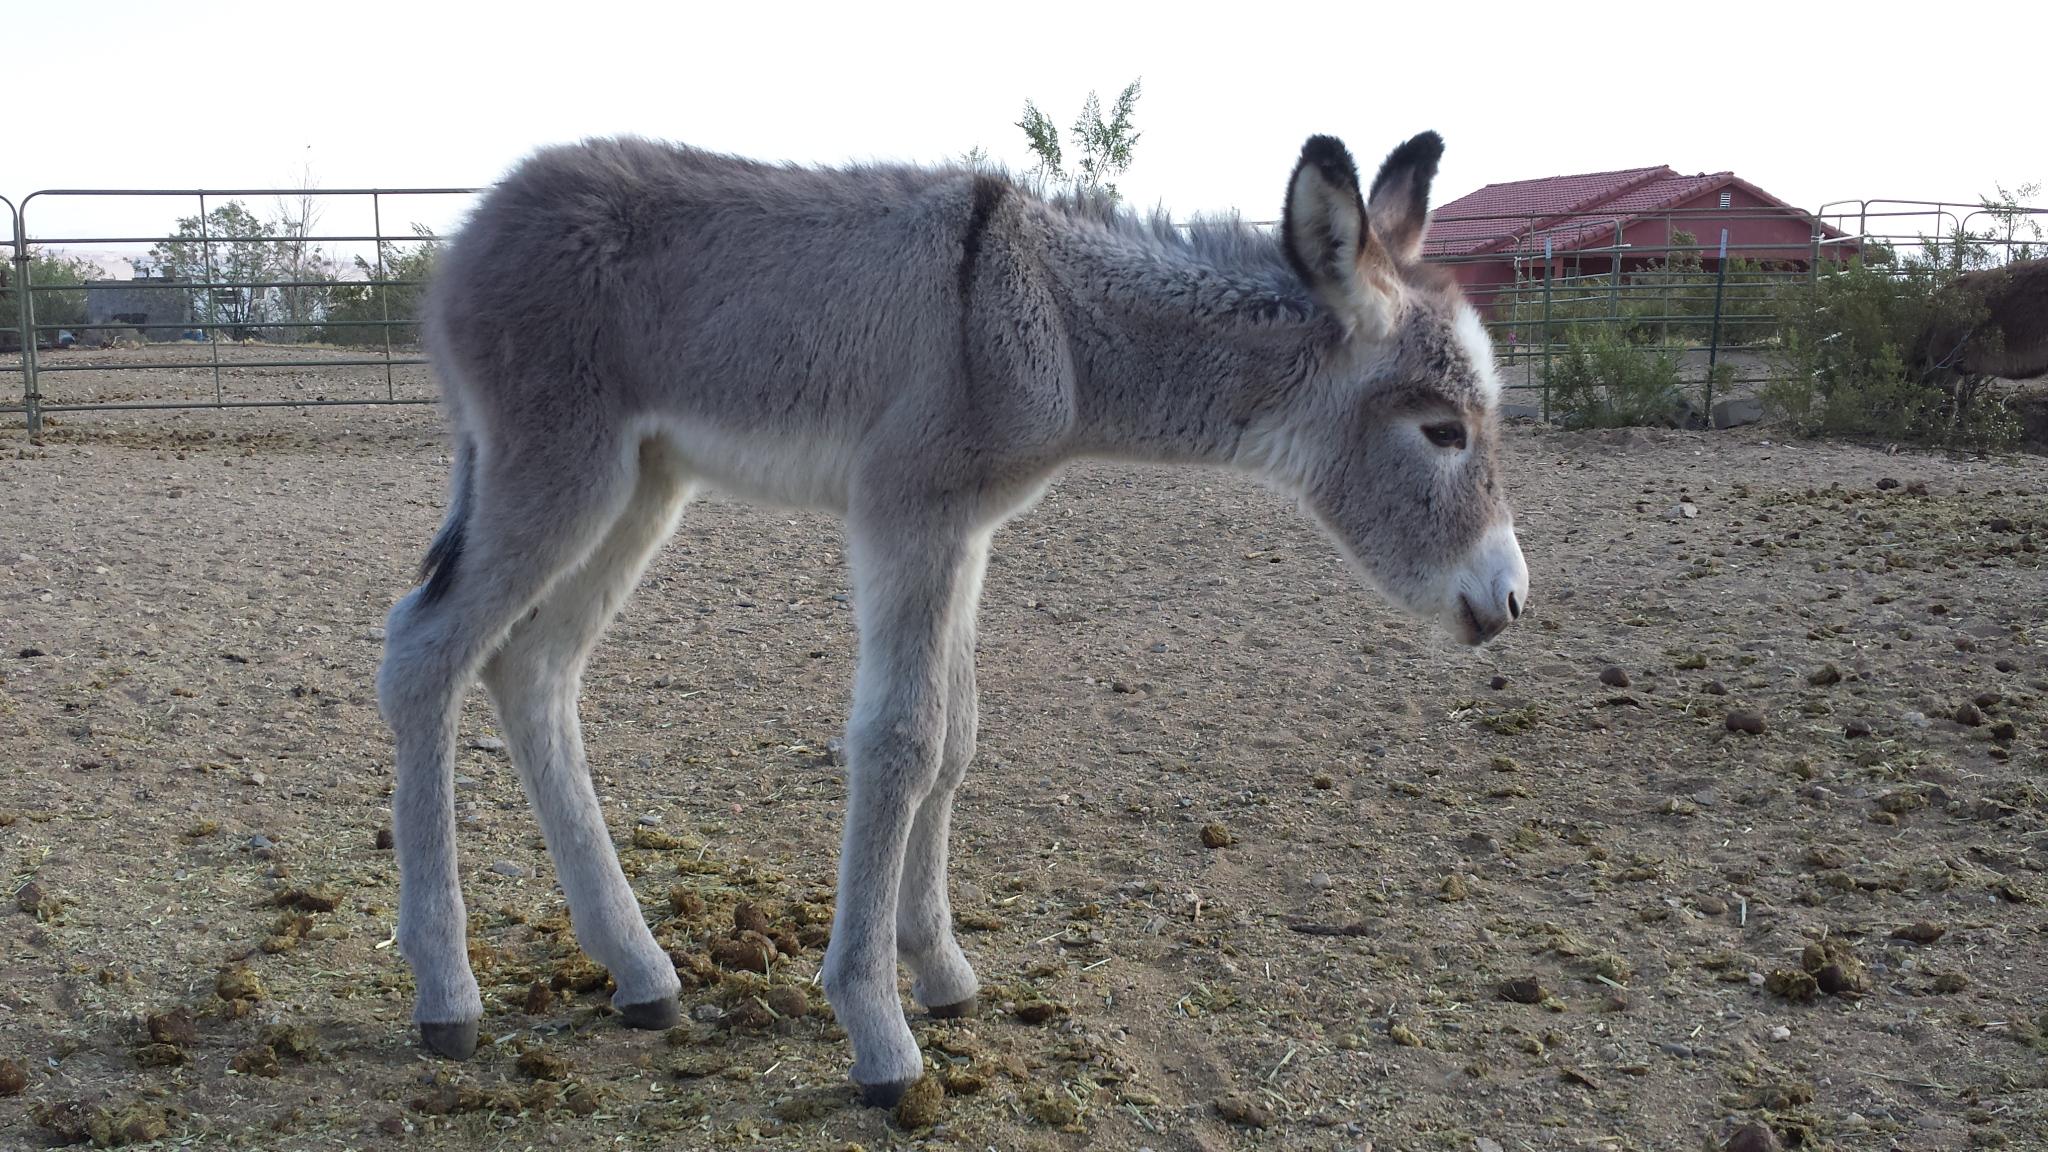 Name The Baby Donkey And Birthday Celebration